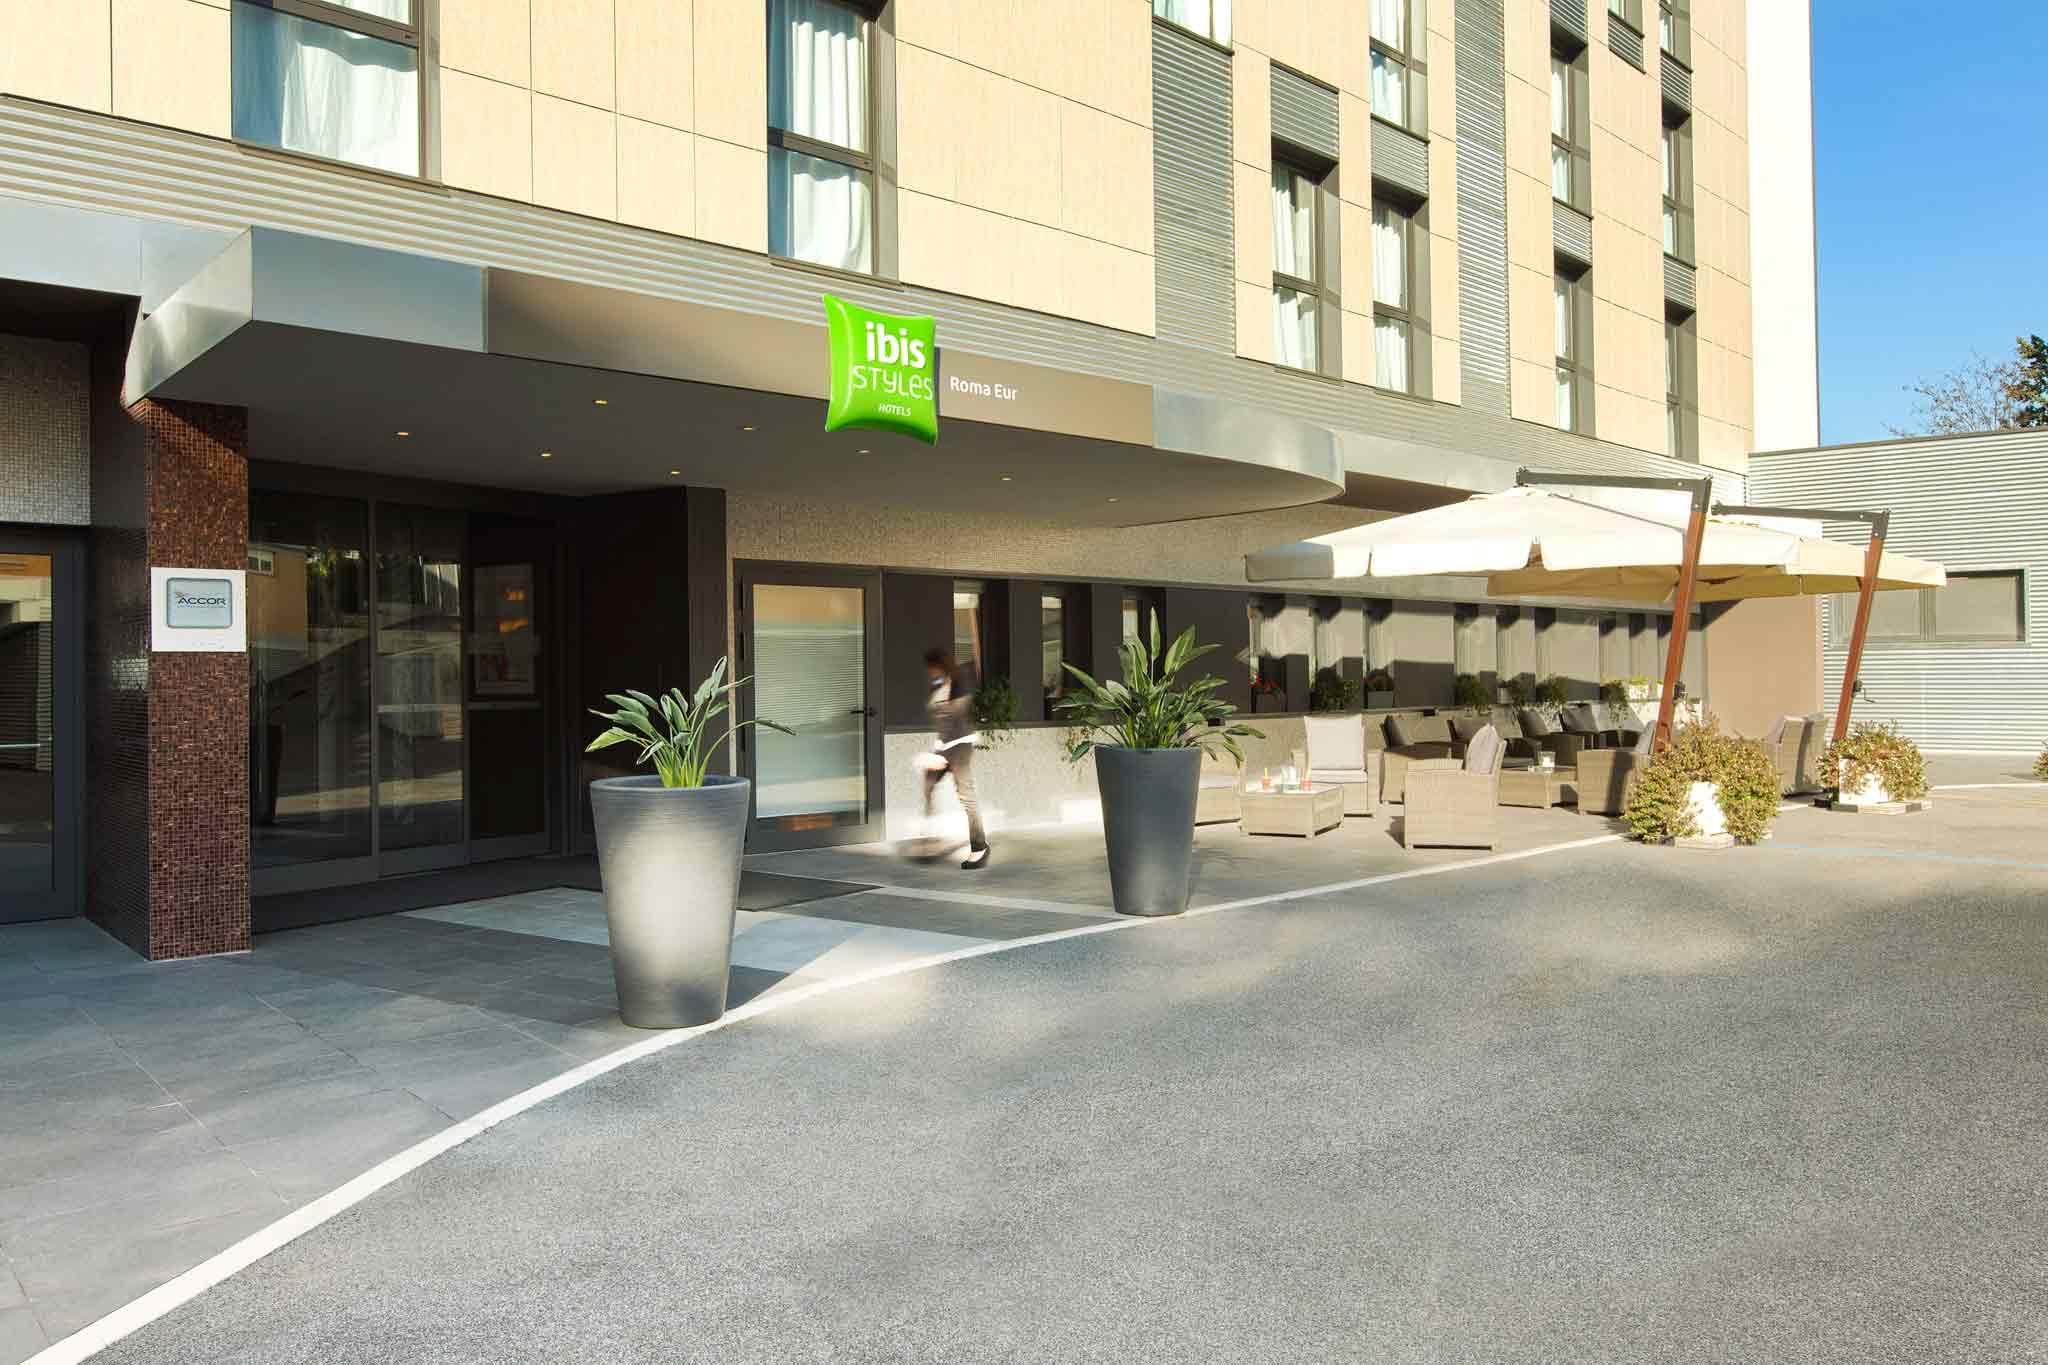 فندق - إيبيس ستايلز ibis Styles روما يور